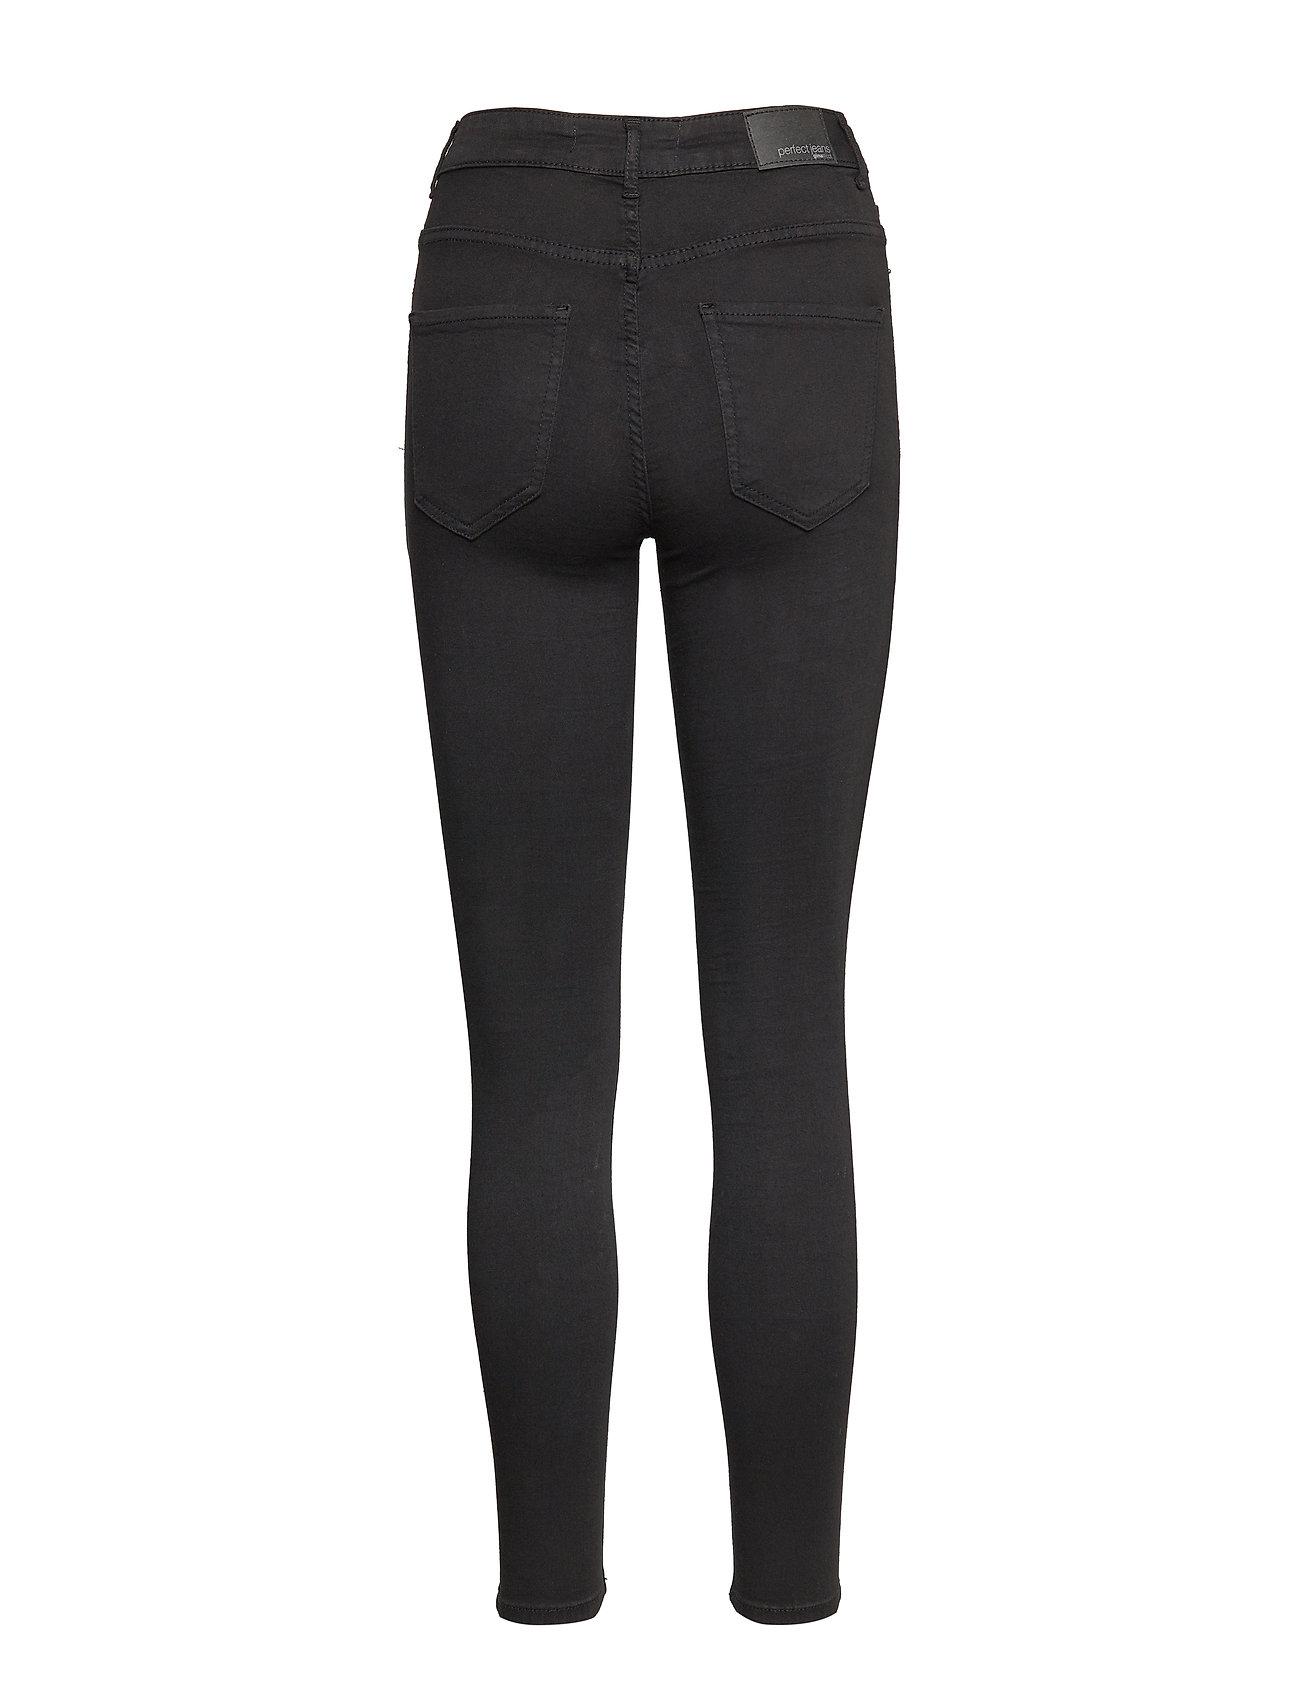 Gina Tricot Molly Highwaist Jeans Black